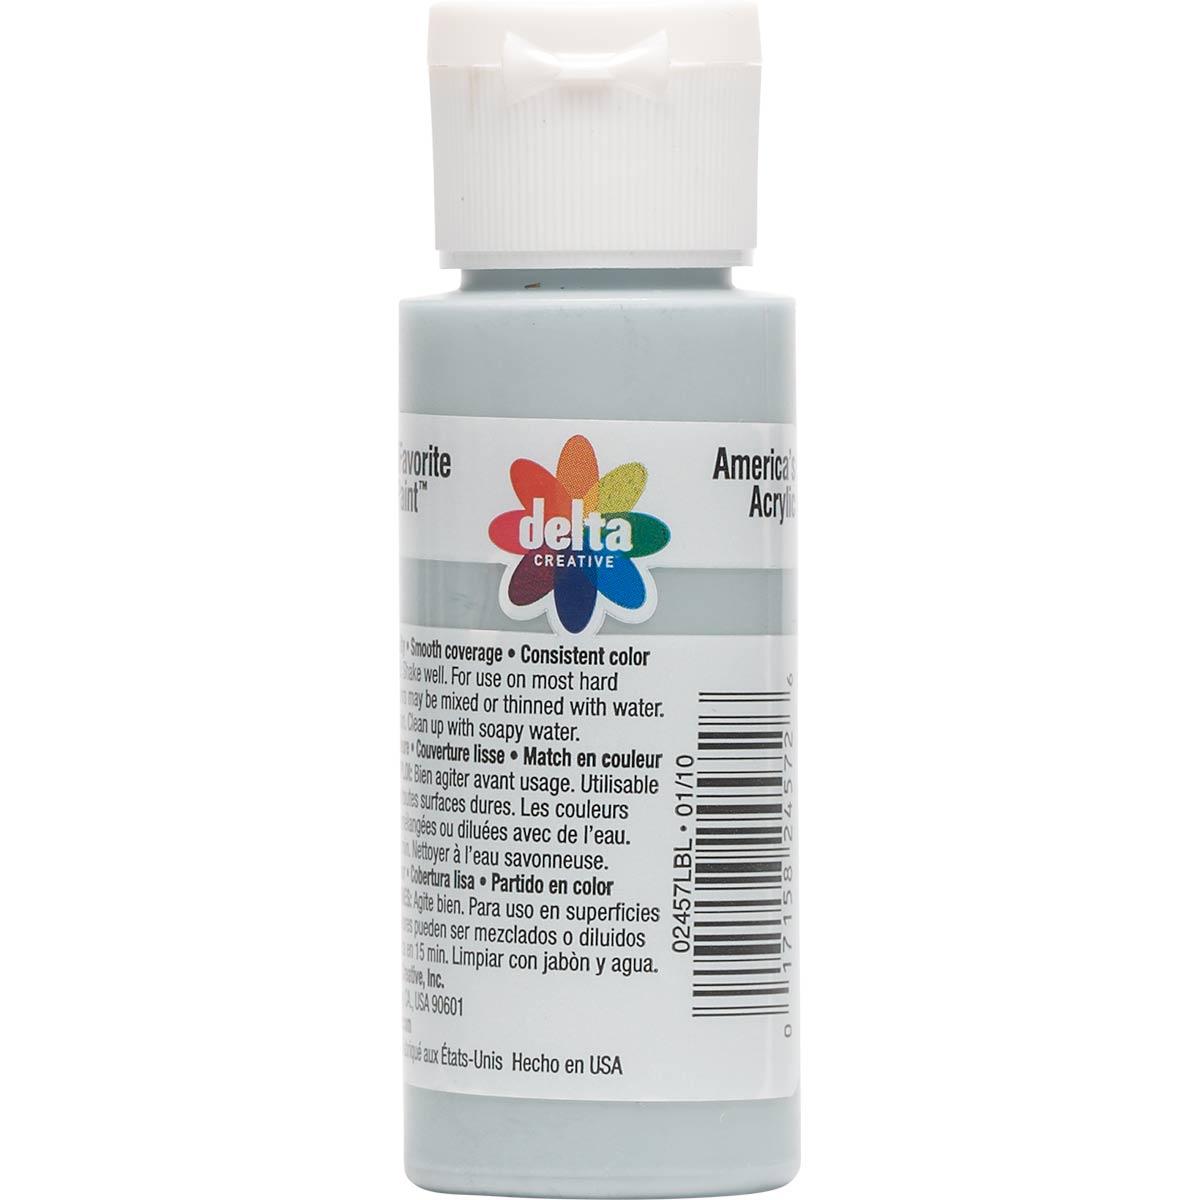 Delta Ceramcoat ® Acrylic Paint - Dolphin Grey, 2 oz. - 024570202W